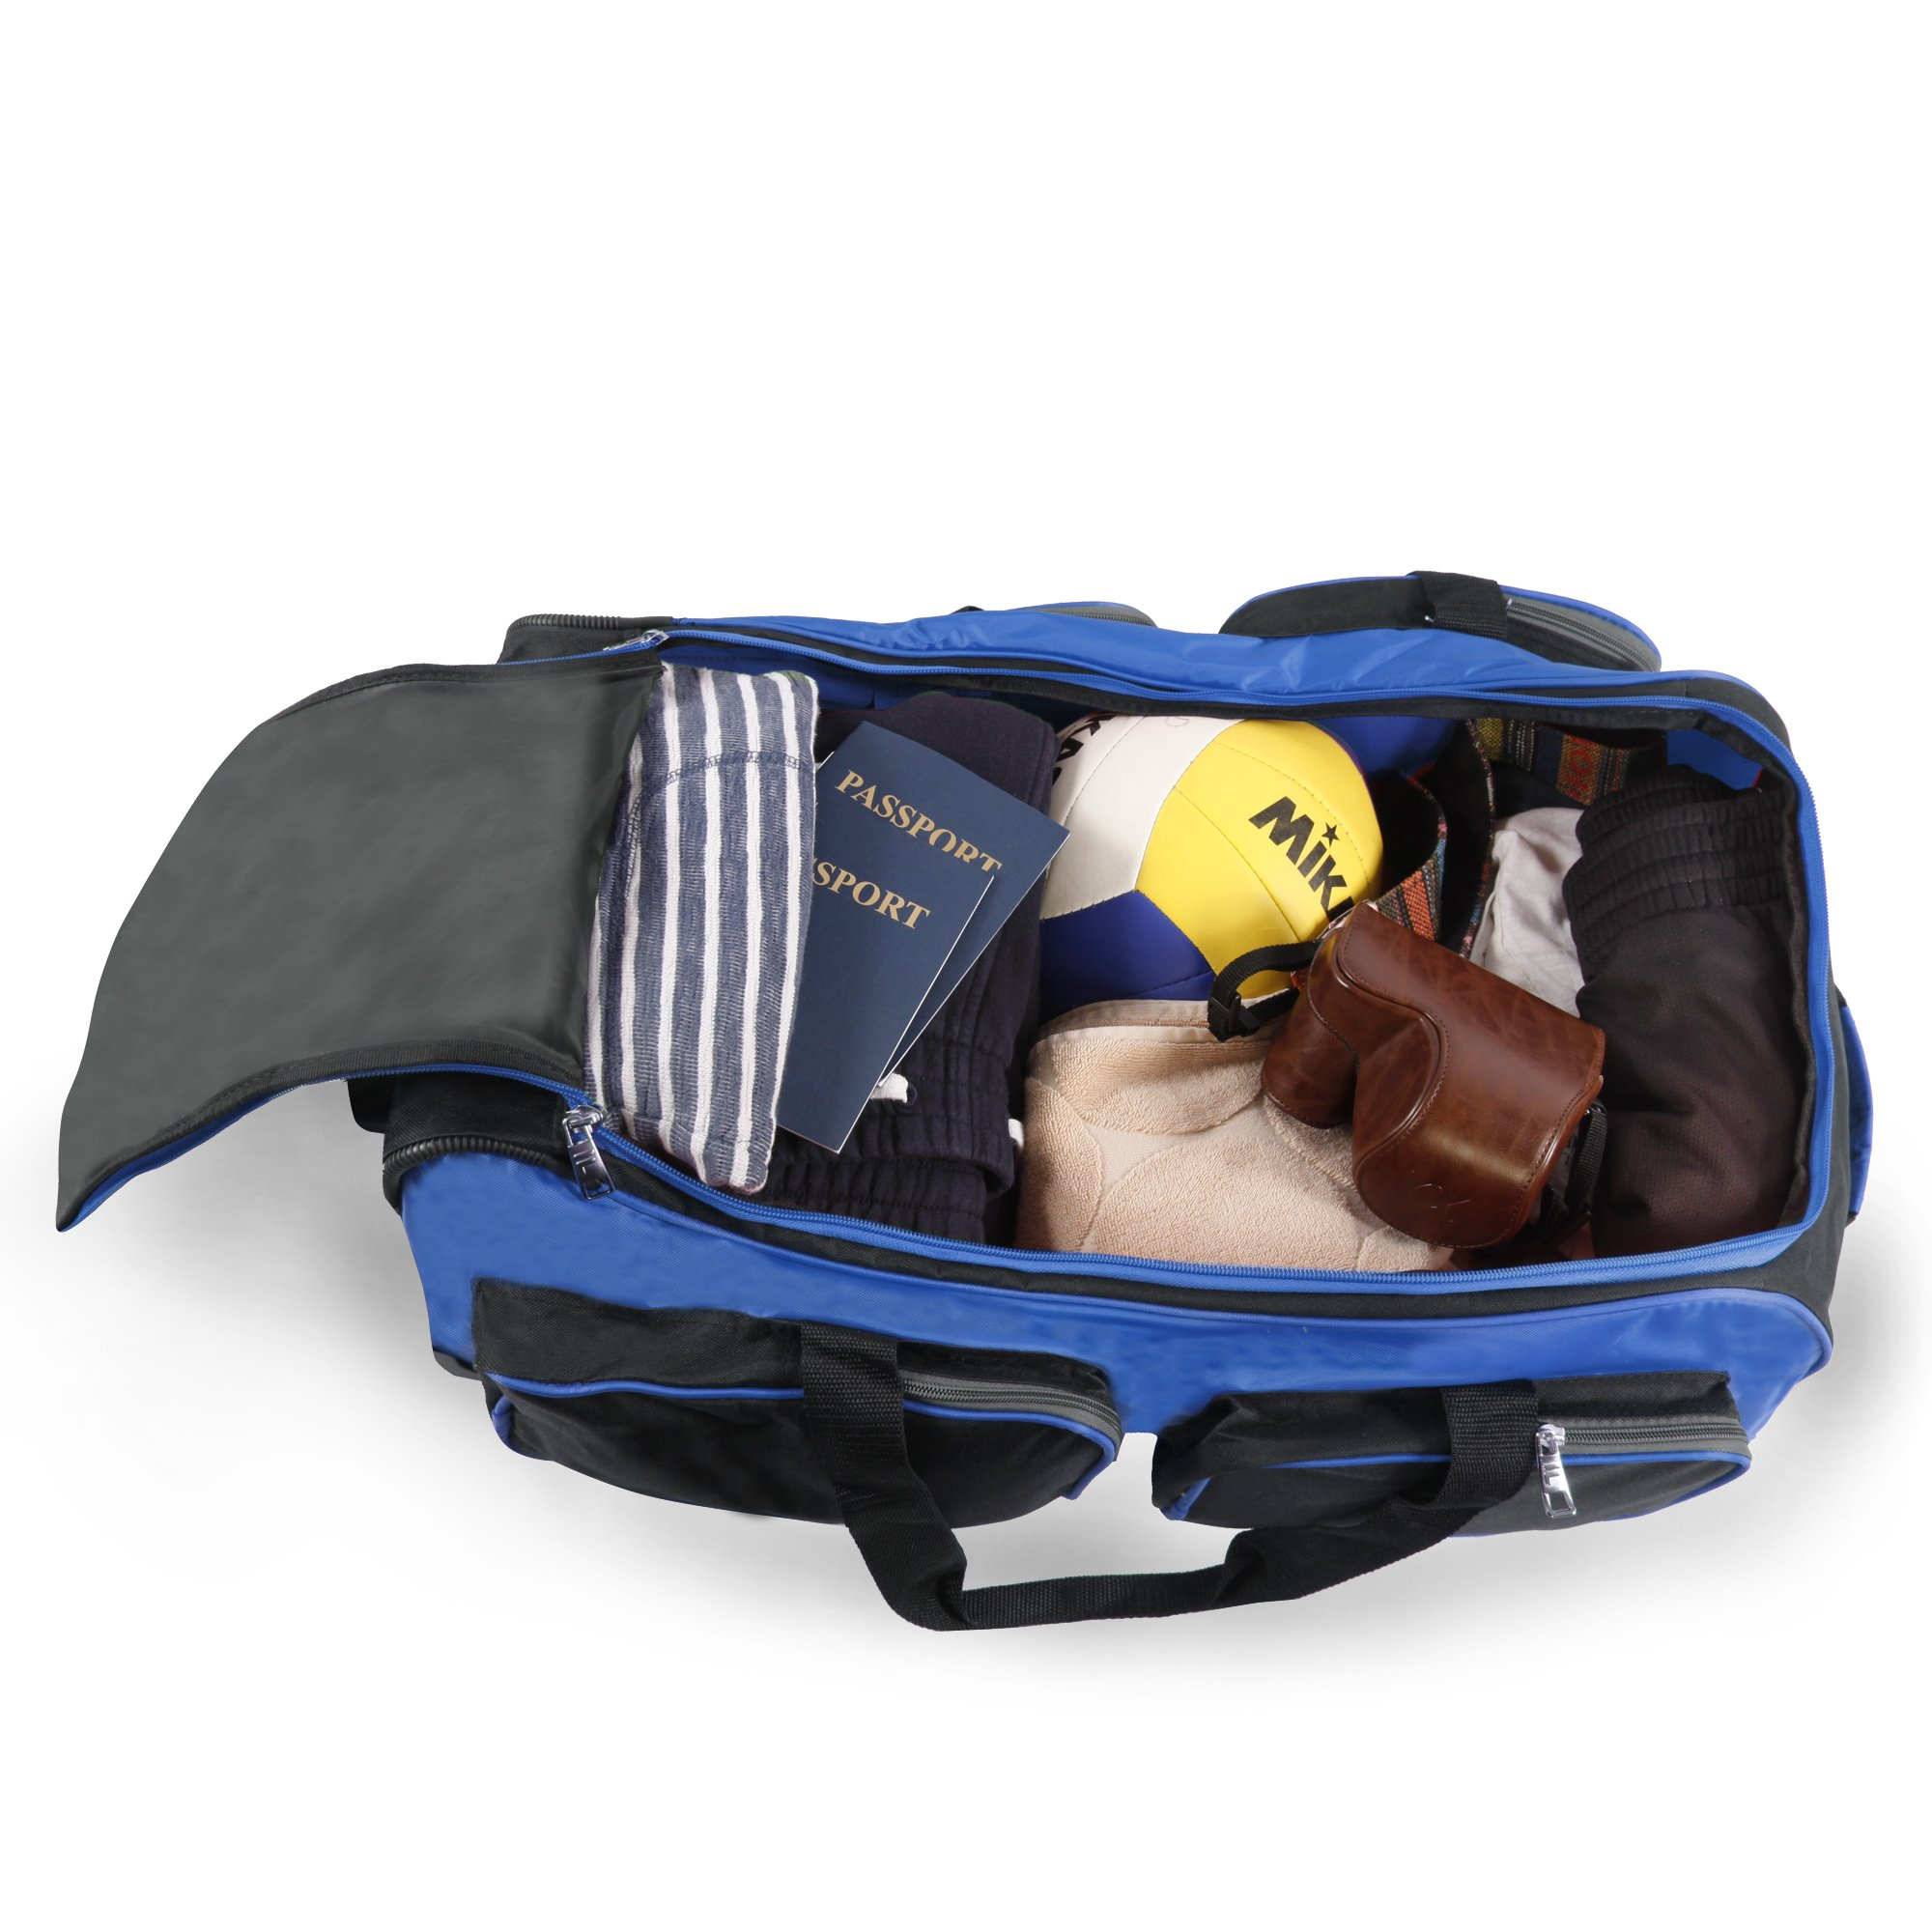 Fila 26'' Lightweight Rolling Duffel Bag, Blue, One Size by Fila (Image #4)